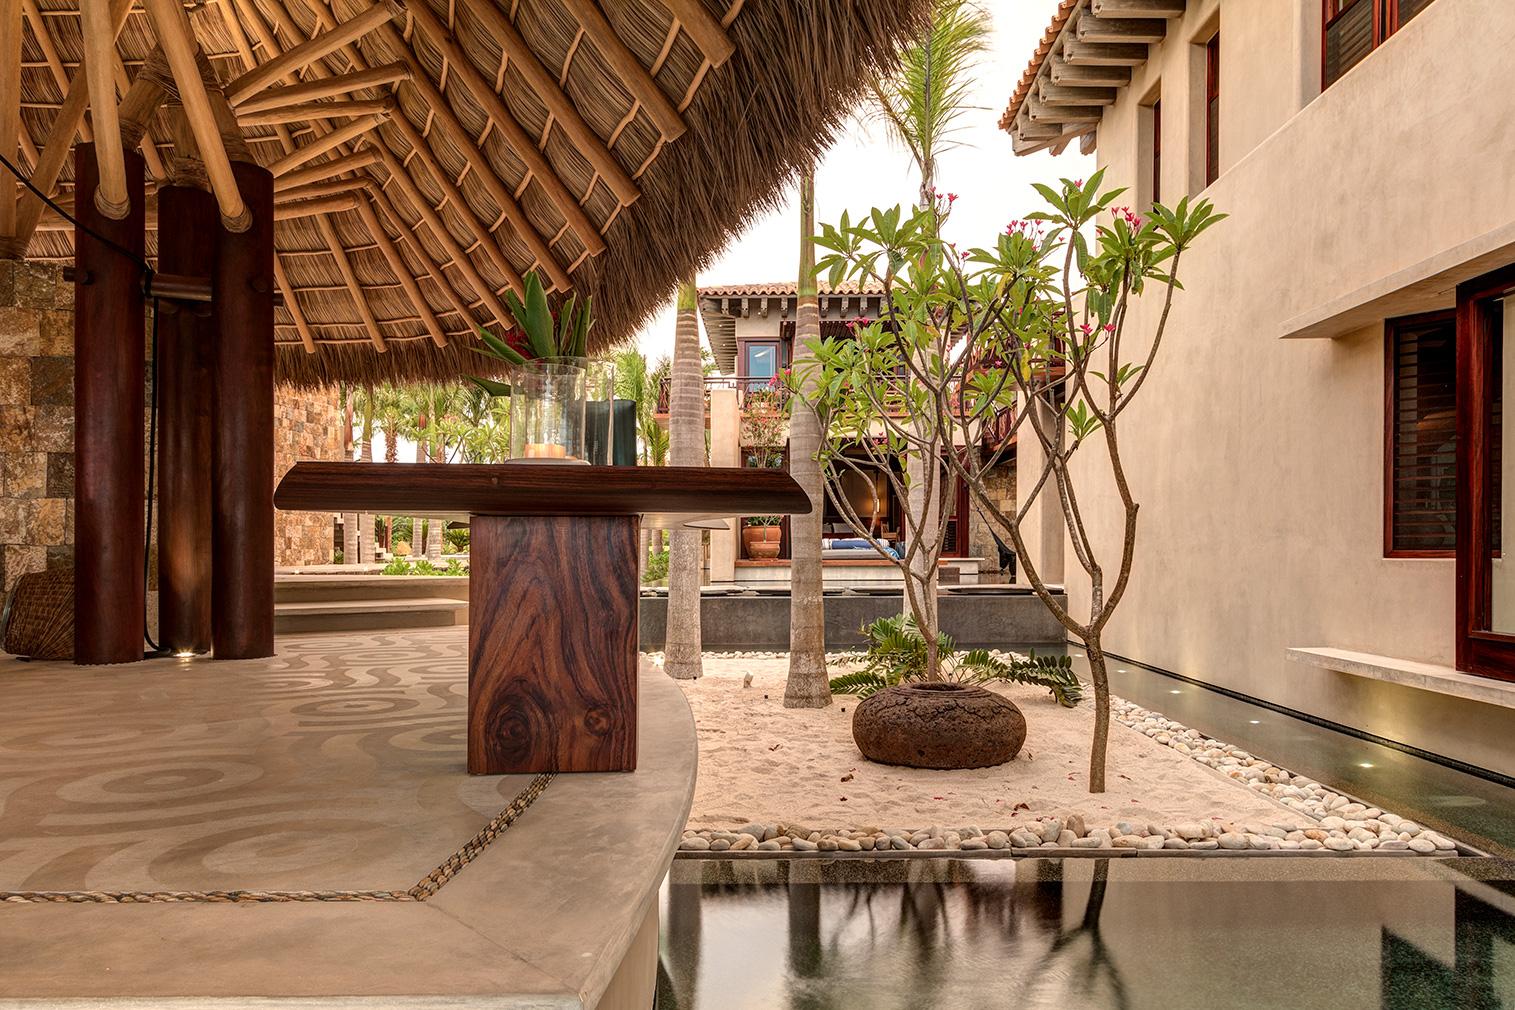 Casa Koko is a barefoot retreat in Mexico's Punta Mita community